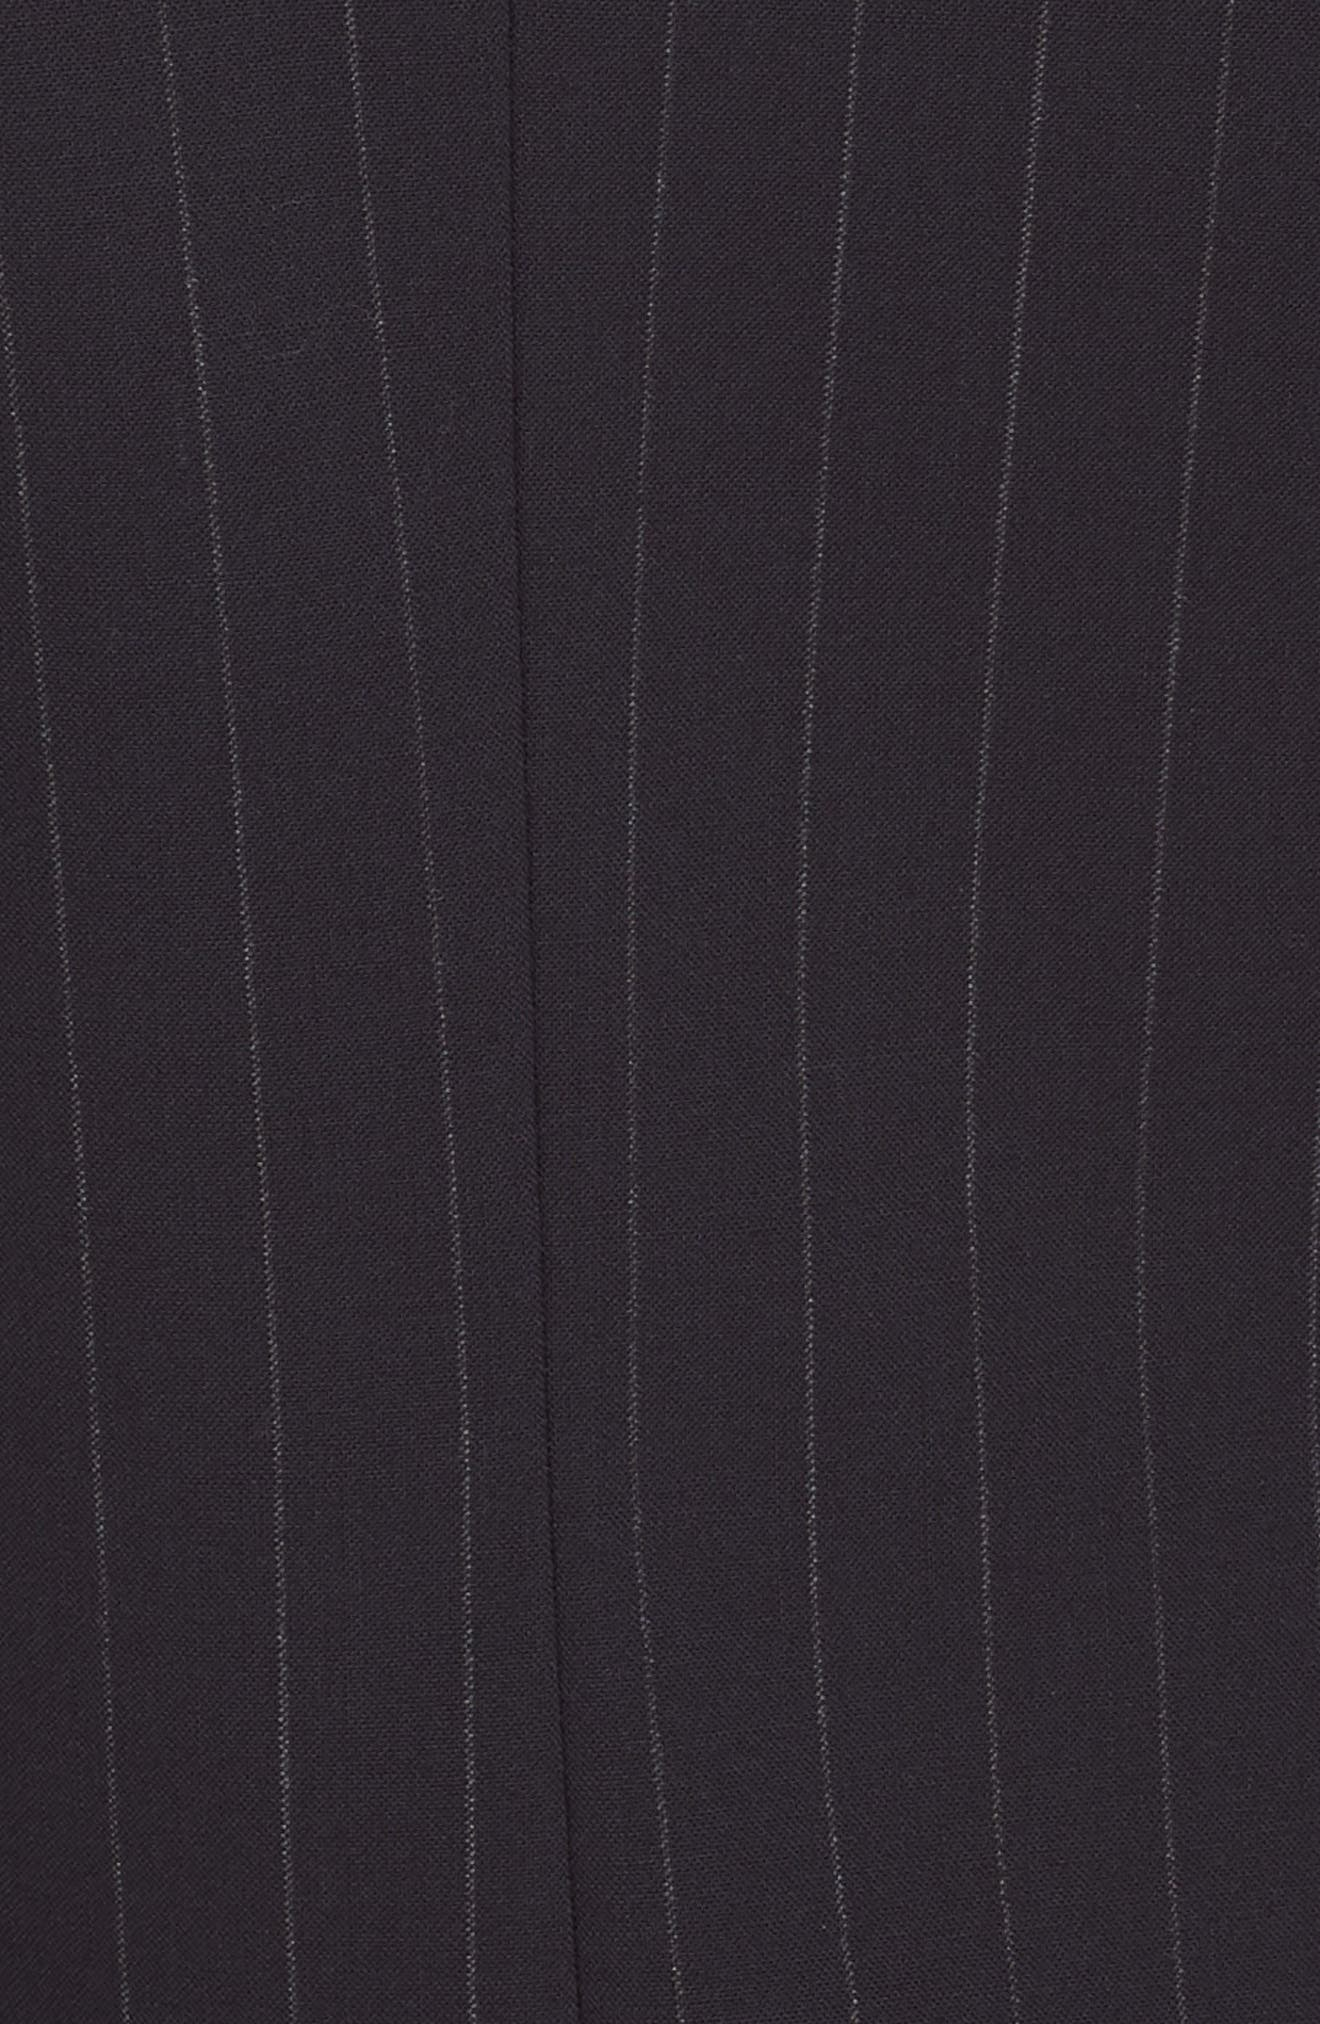 Pinstripe Blazer Dress,                             Alternate thumbnail 5, color,                             DEEP NAVY/ GREY